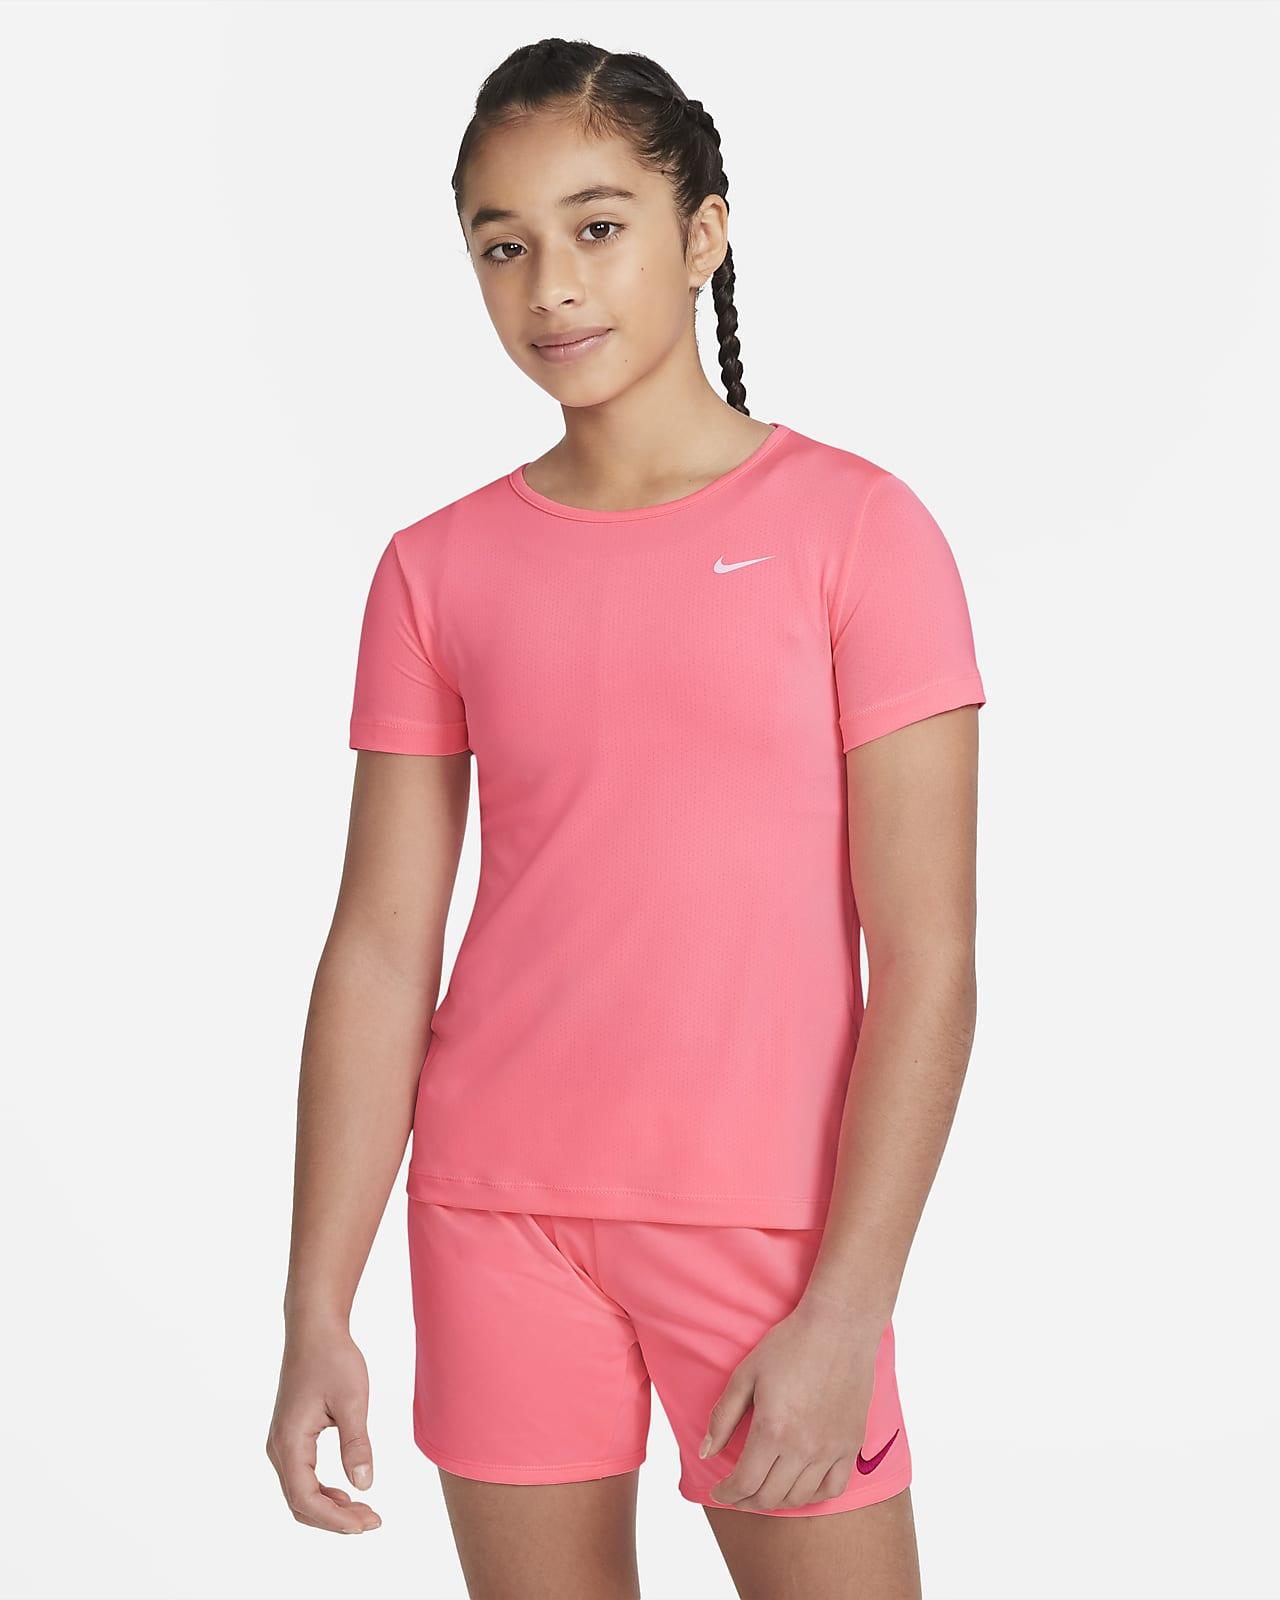 Nike Pro Older Kids' (Girls') Short-Sleeve Top